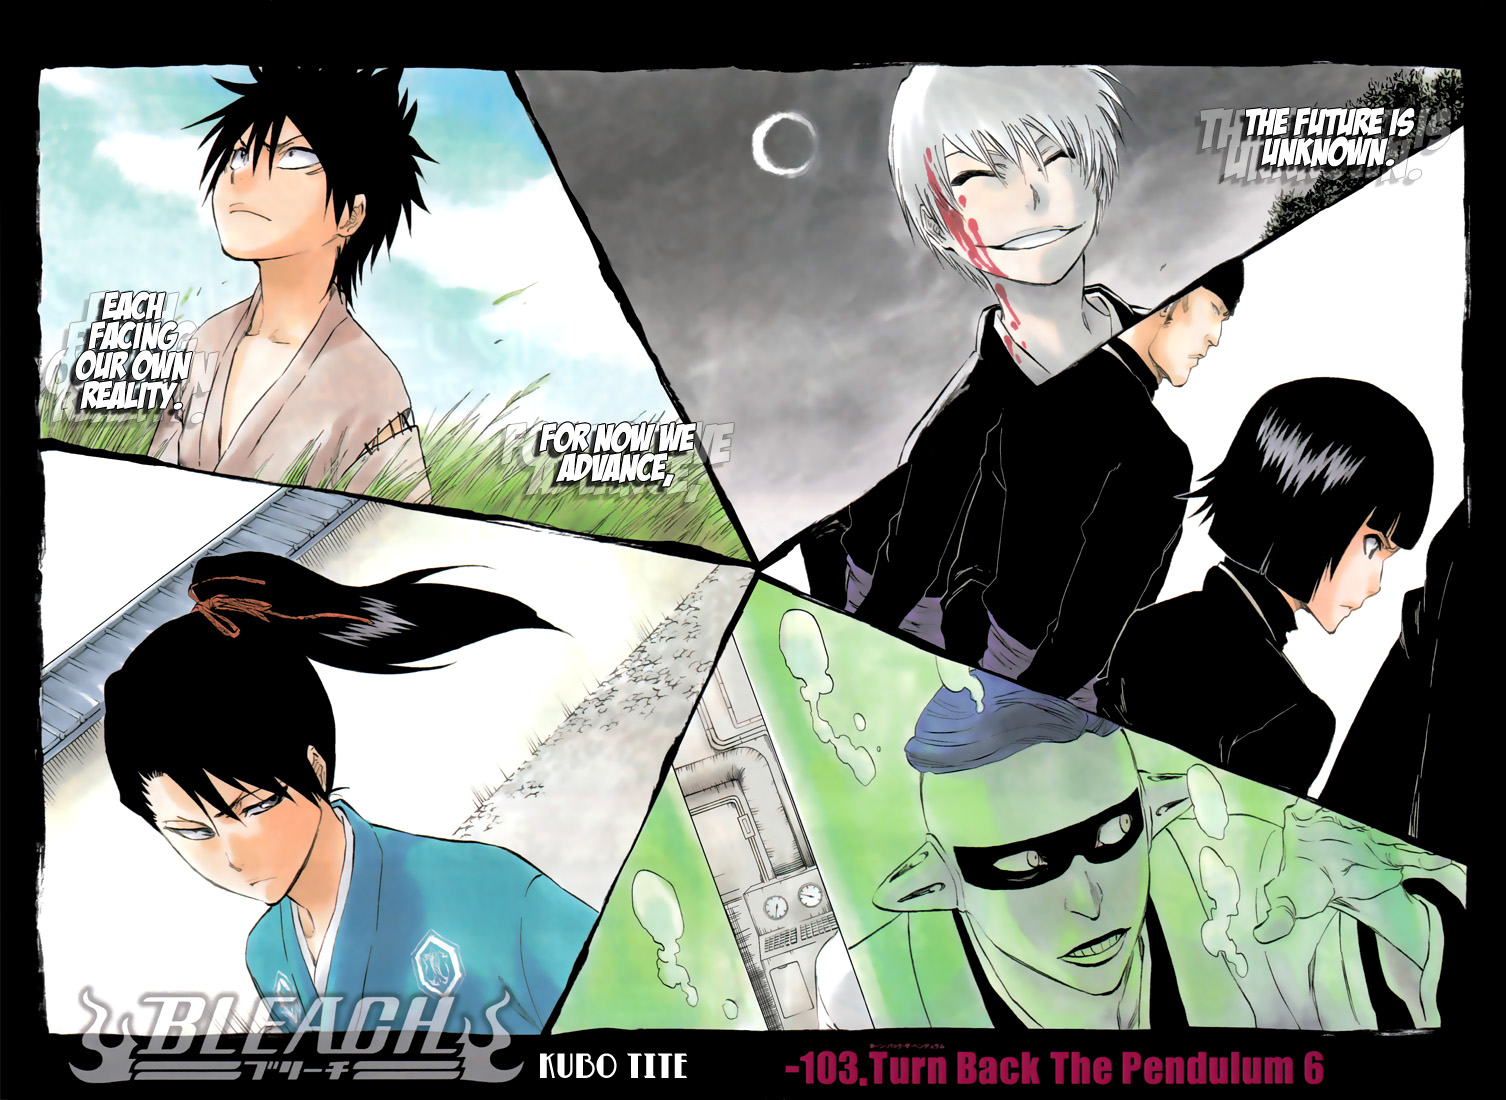 Kapitel -103: Turn Back The Pendulum 6